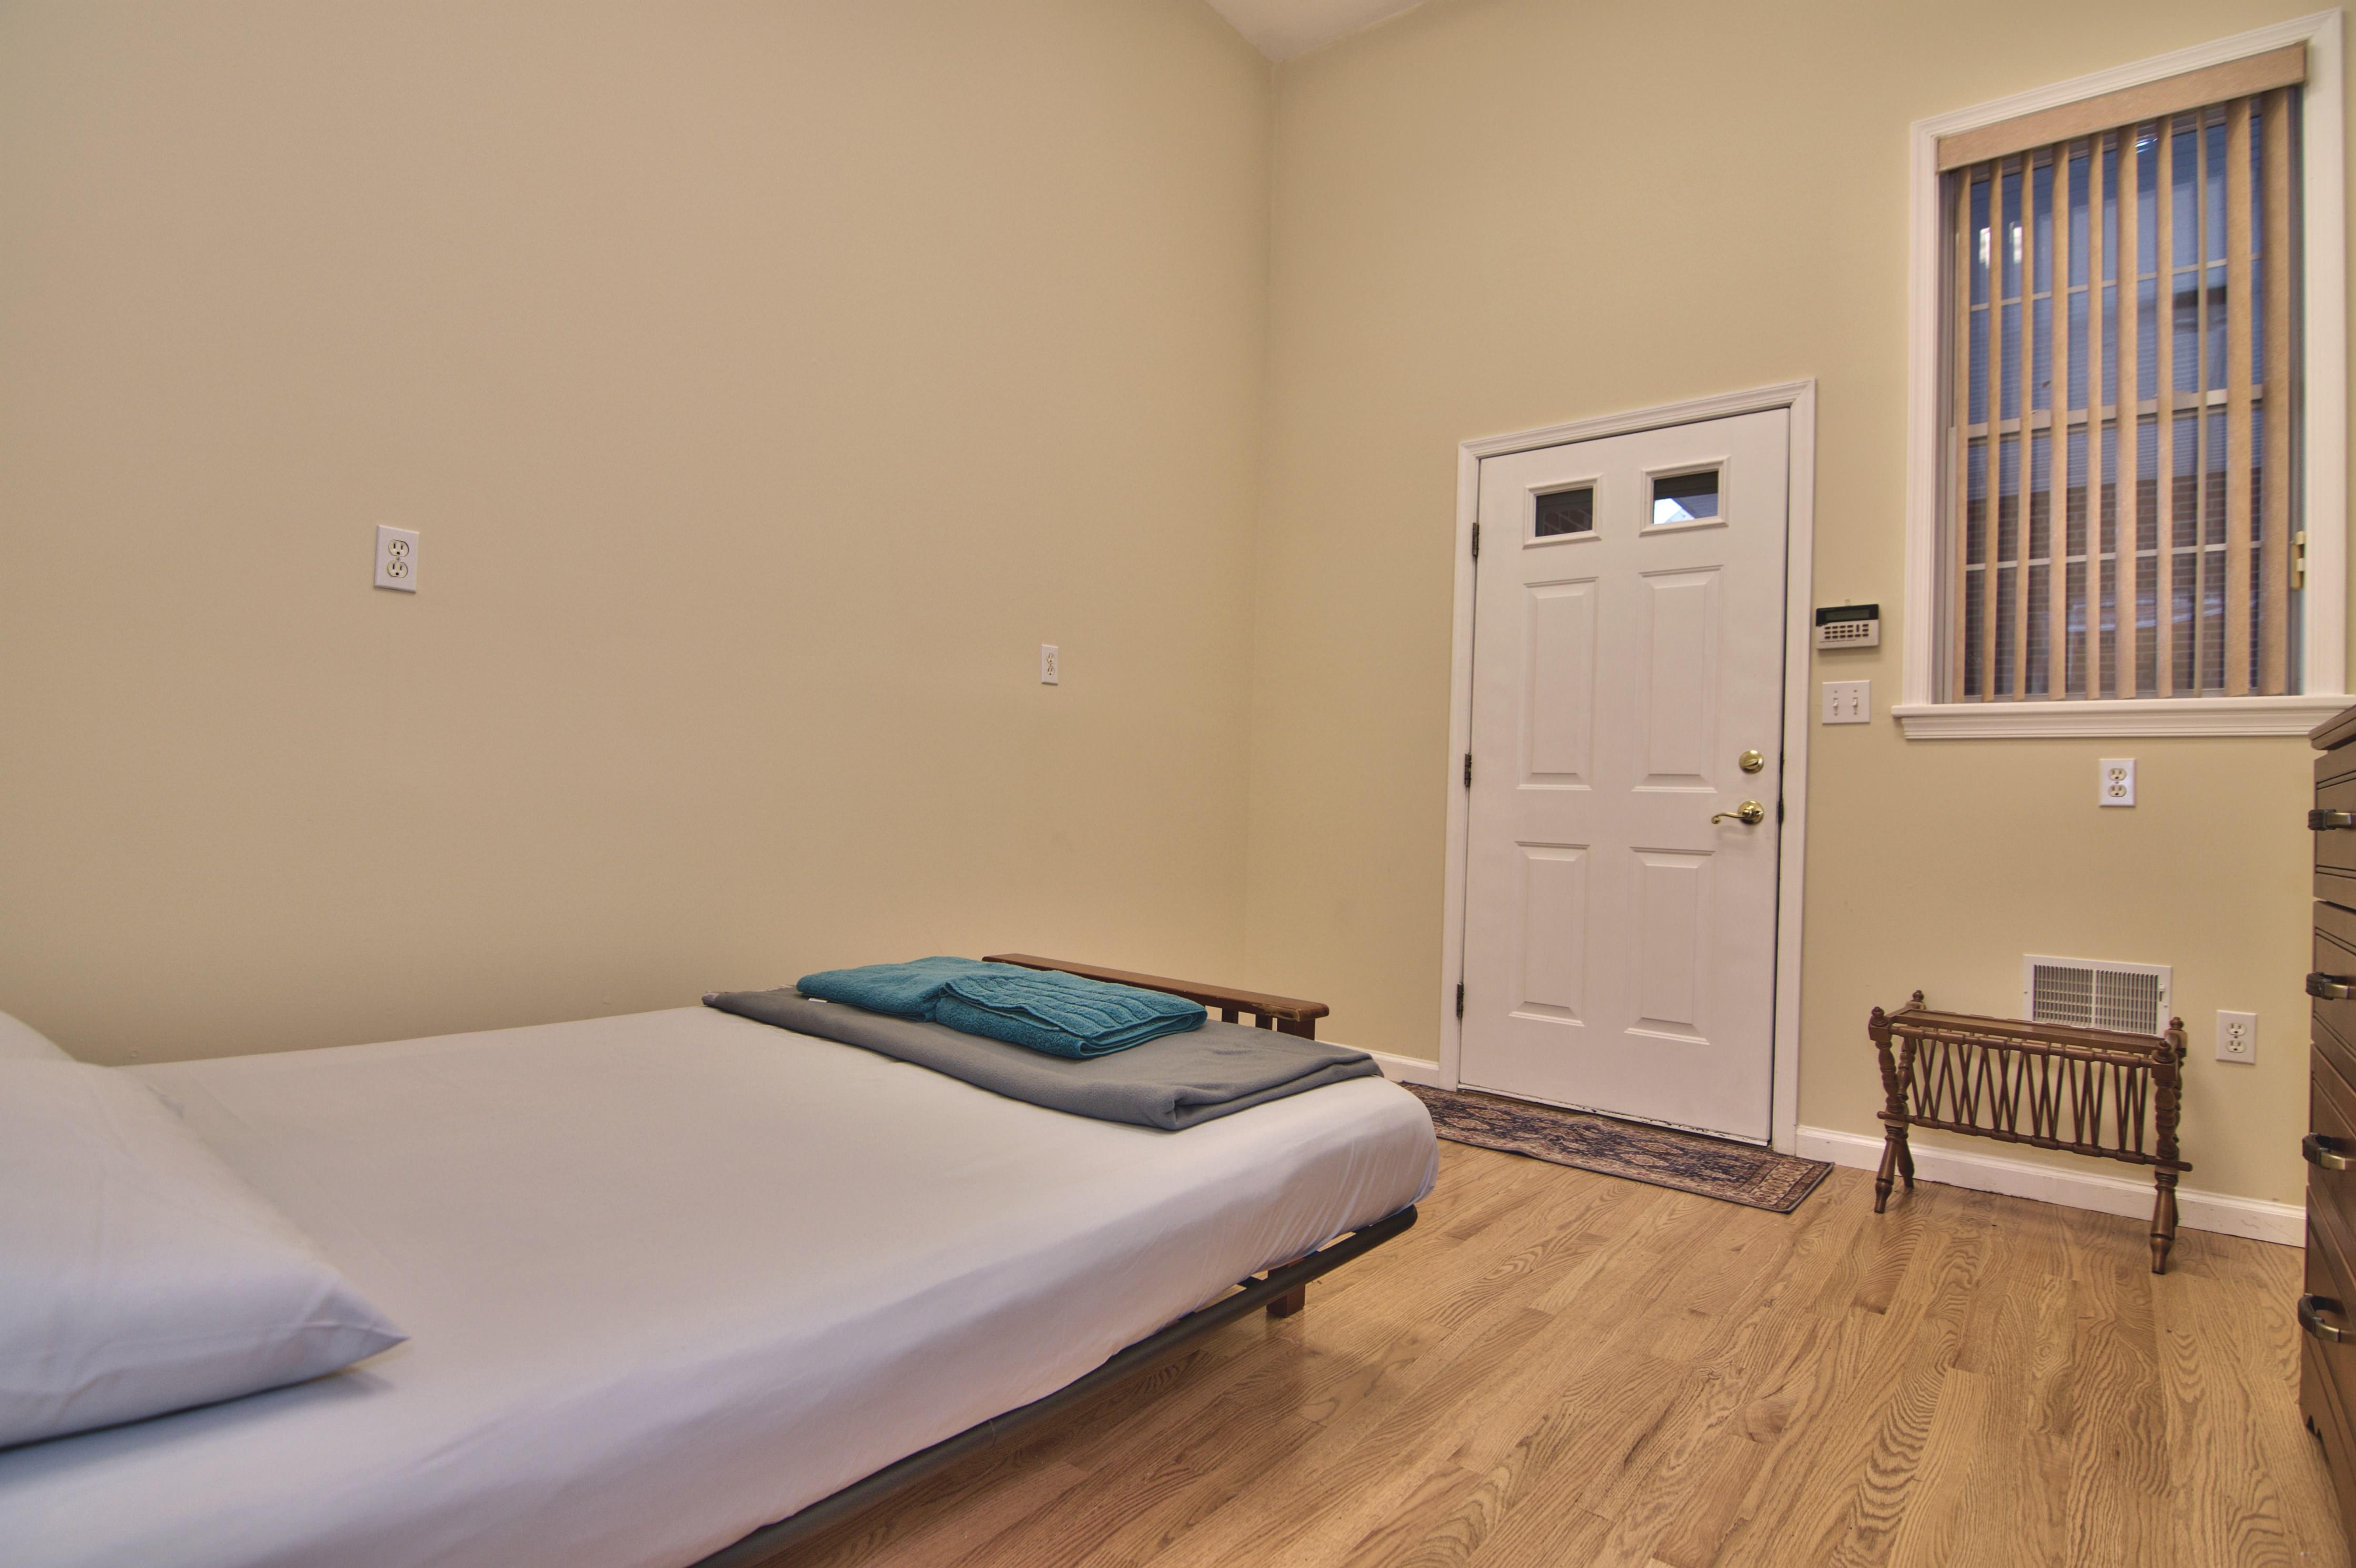 airbnb in poconos with indoor pool